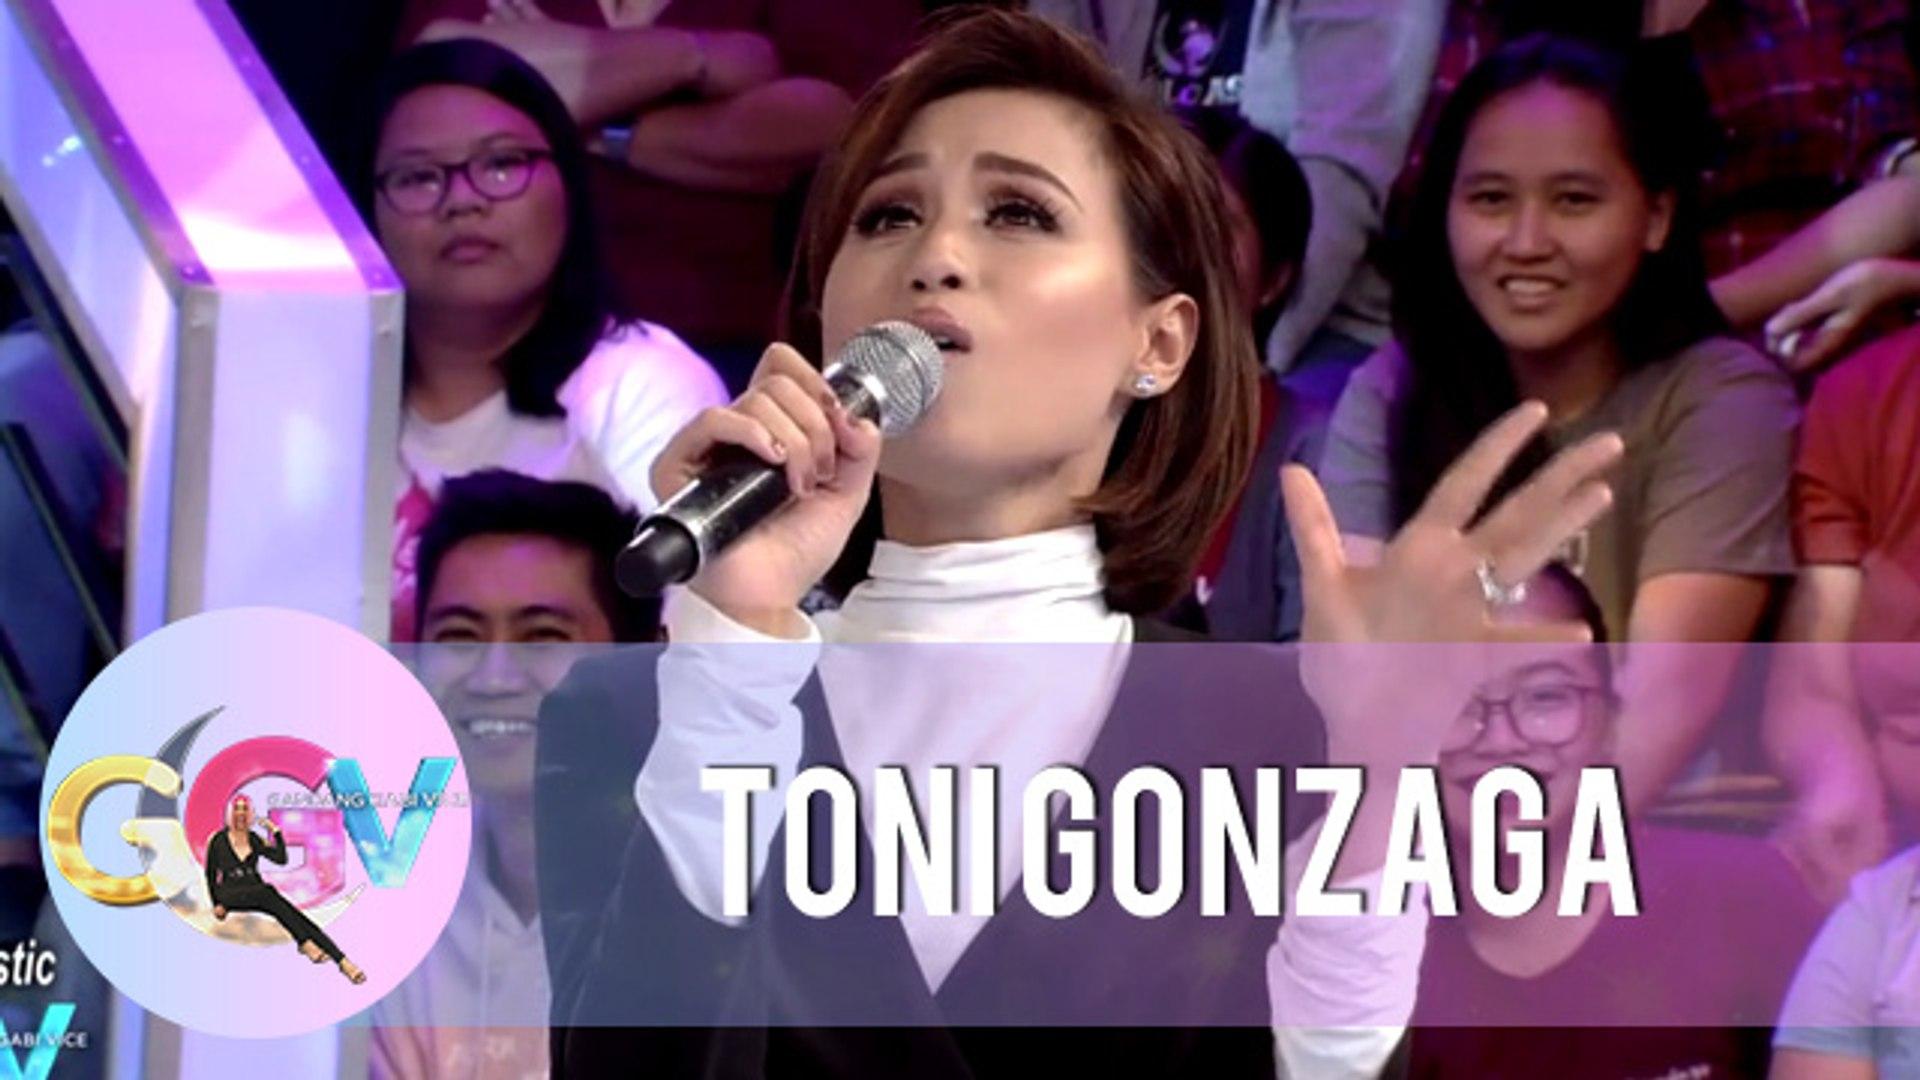 GGV: Toni dance to the trending